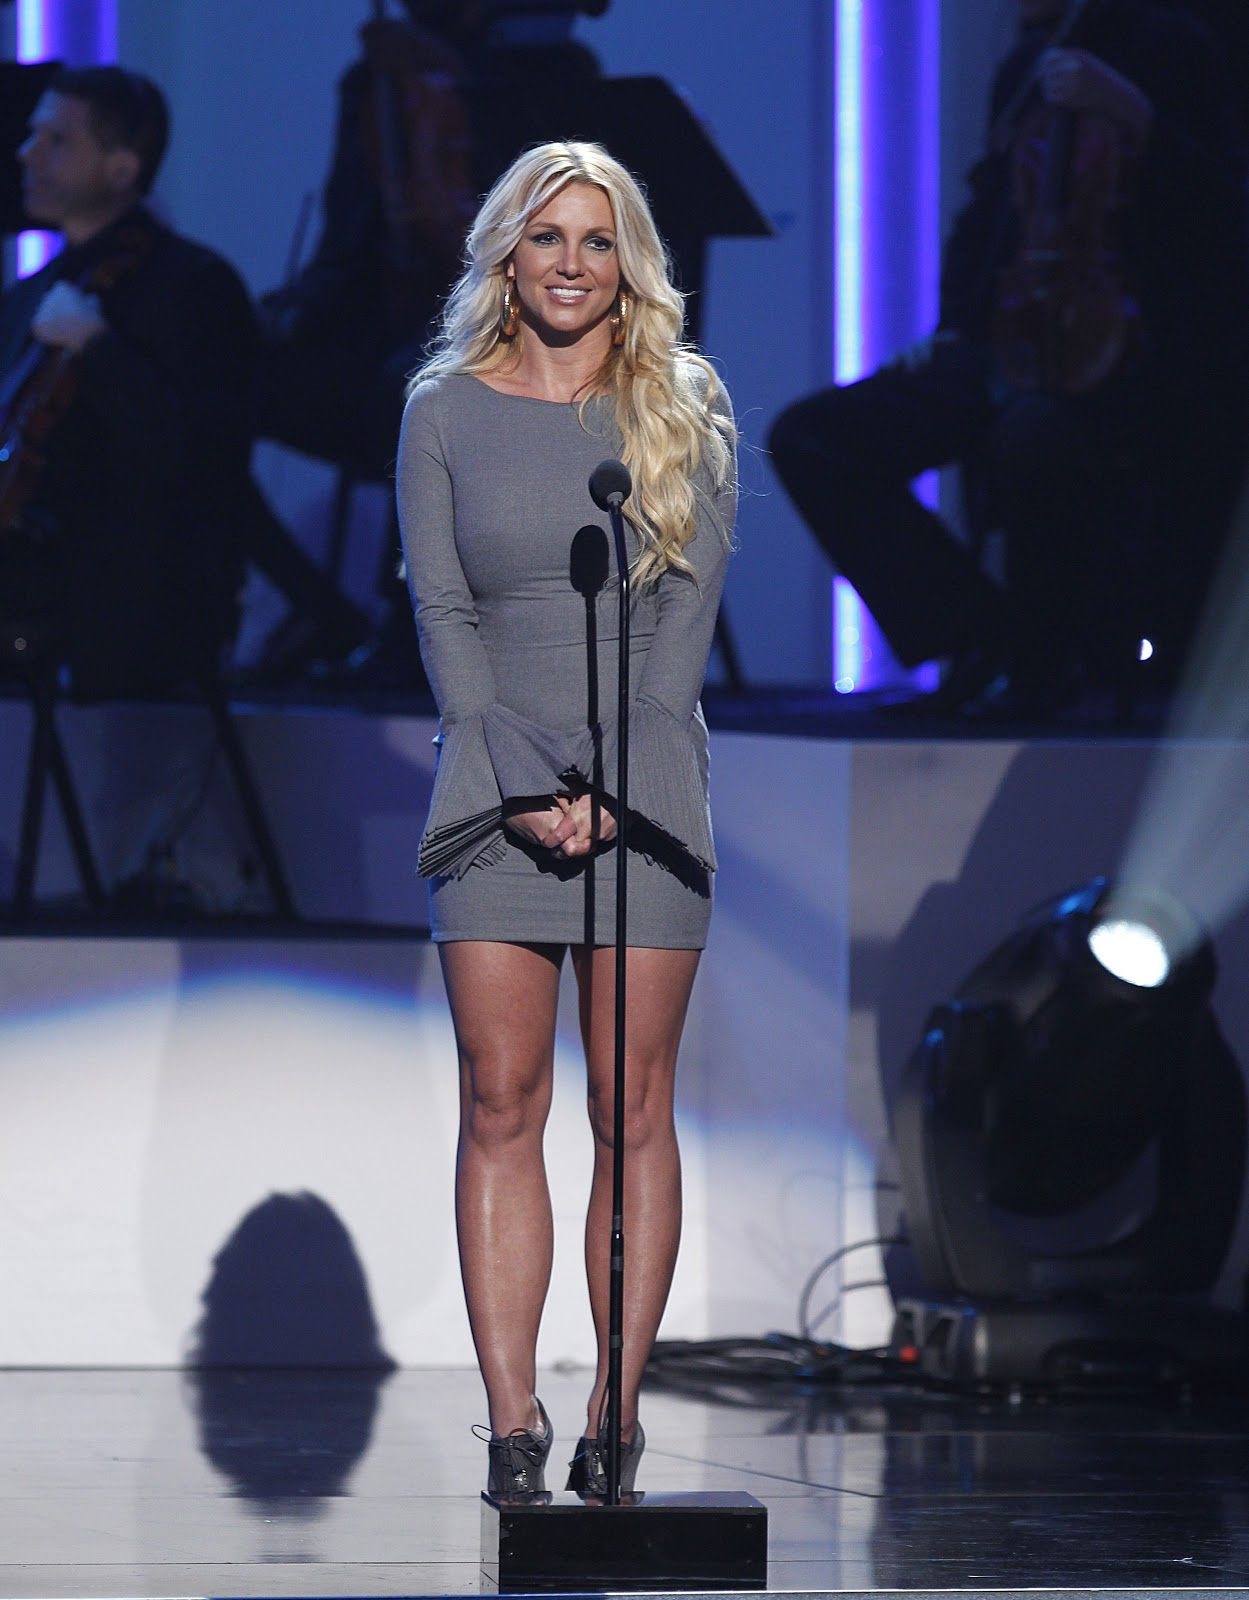 http://4.bp.blogspot.com/-NdkPeHjeNDE/UHln2QTirHI/AAAAAAAAS7E/LiNN_fWUeP4/s1600/Britney+Spears+at+A+Grammy+Salute+to+Whitney+Houston+Oct++2012-05.jpg